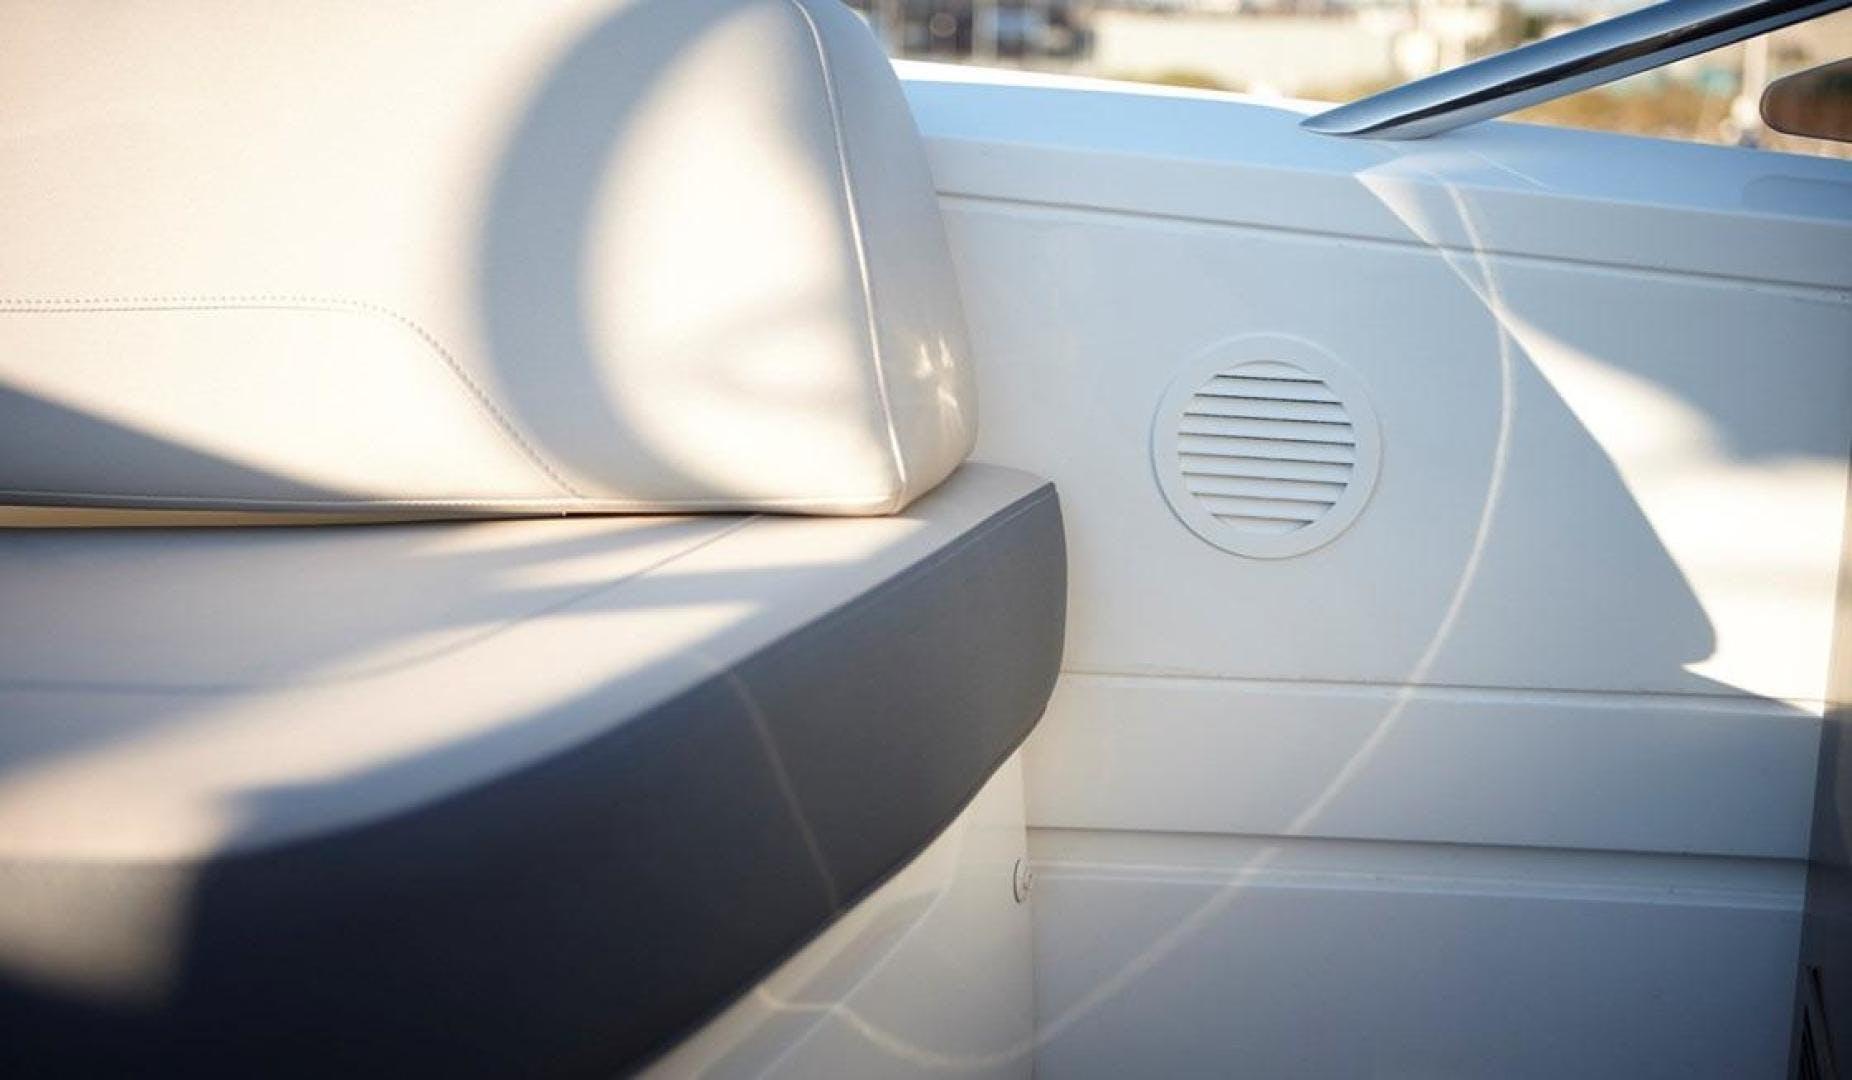 2017 Princess Yachts International 65' S65 Namaste   Picture 6 of 20